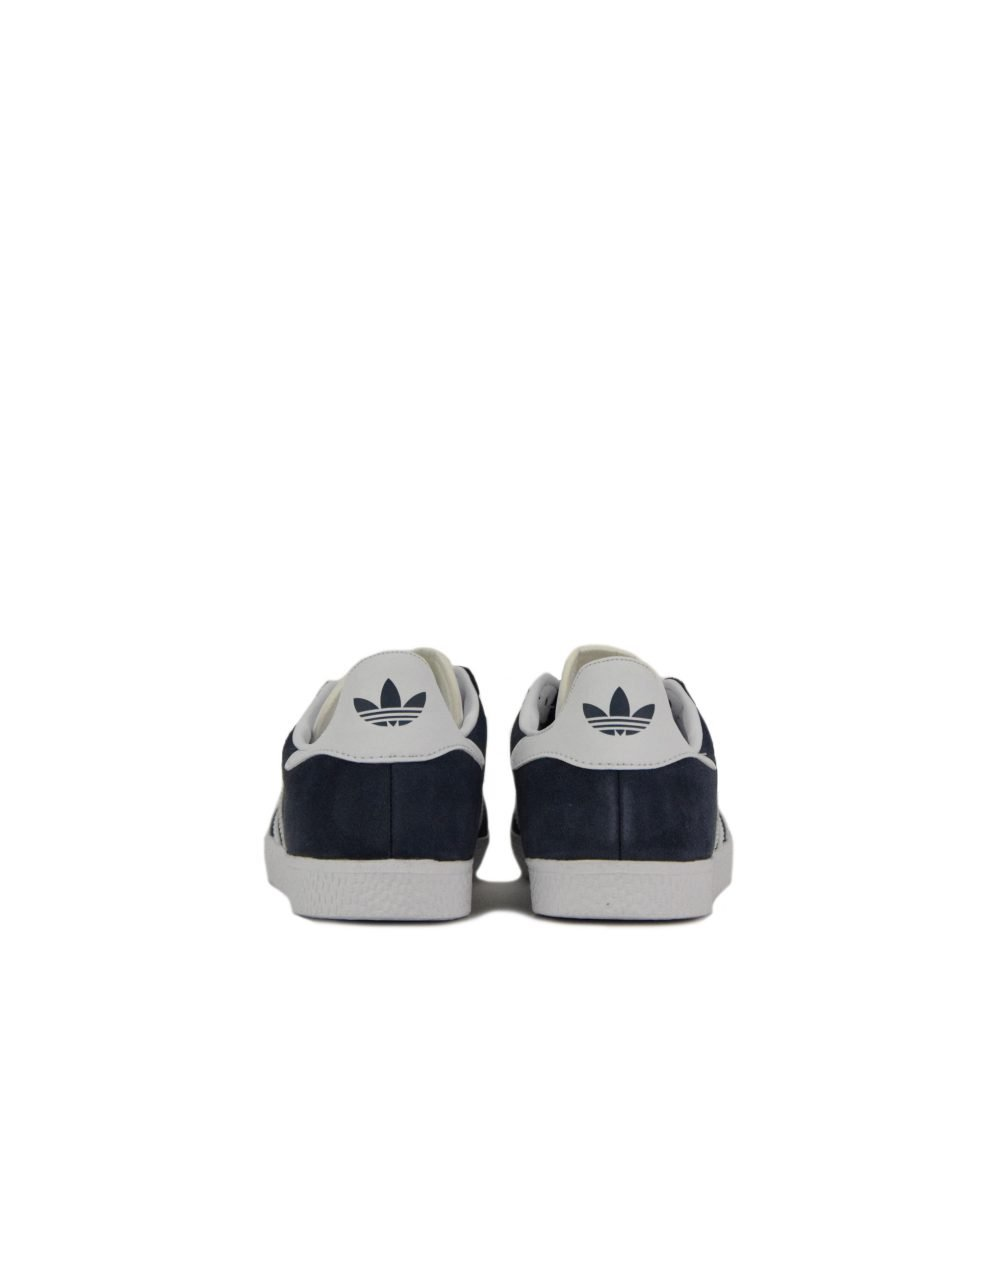 Adidas Gazelle J (BY9144) Navy/White